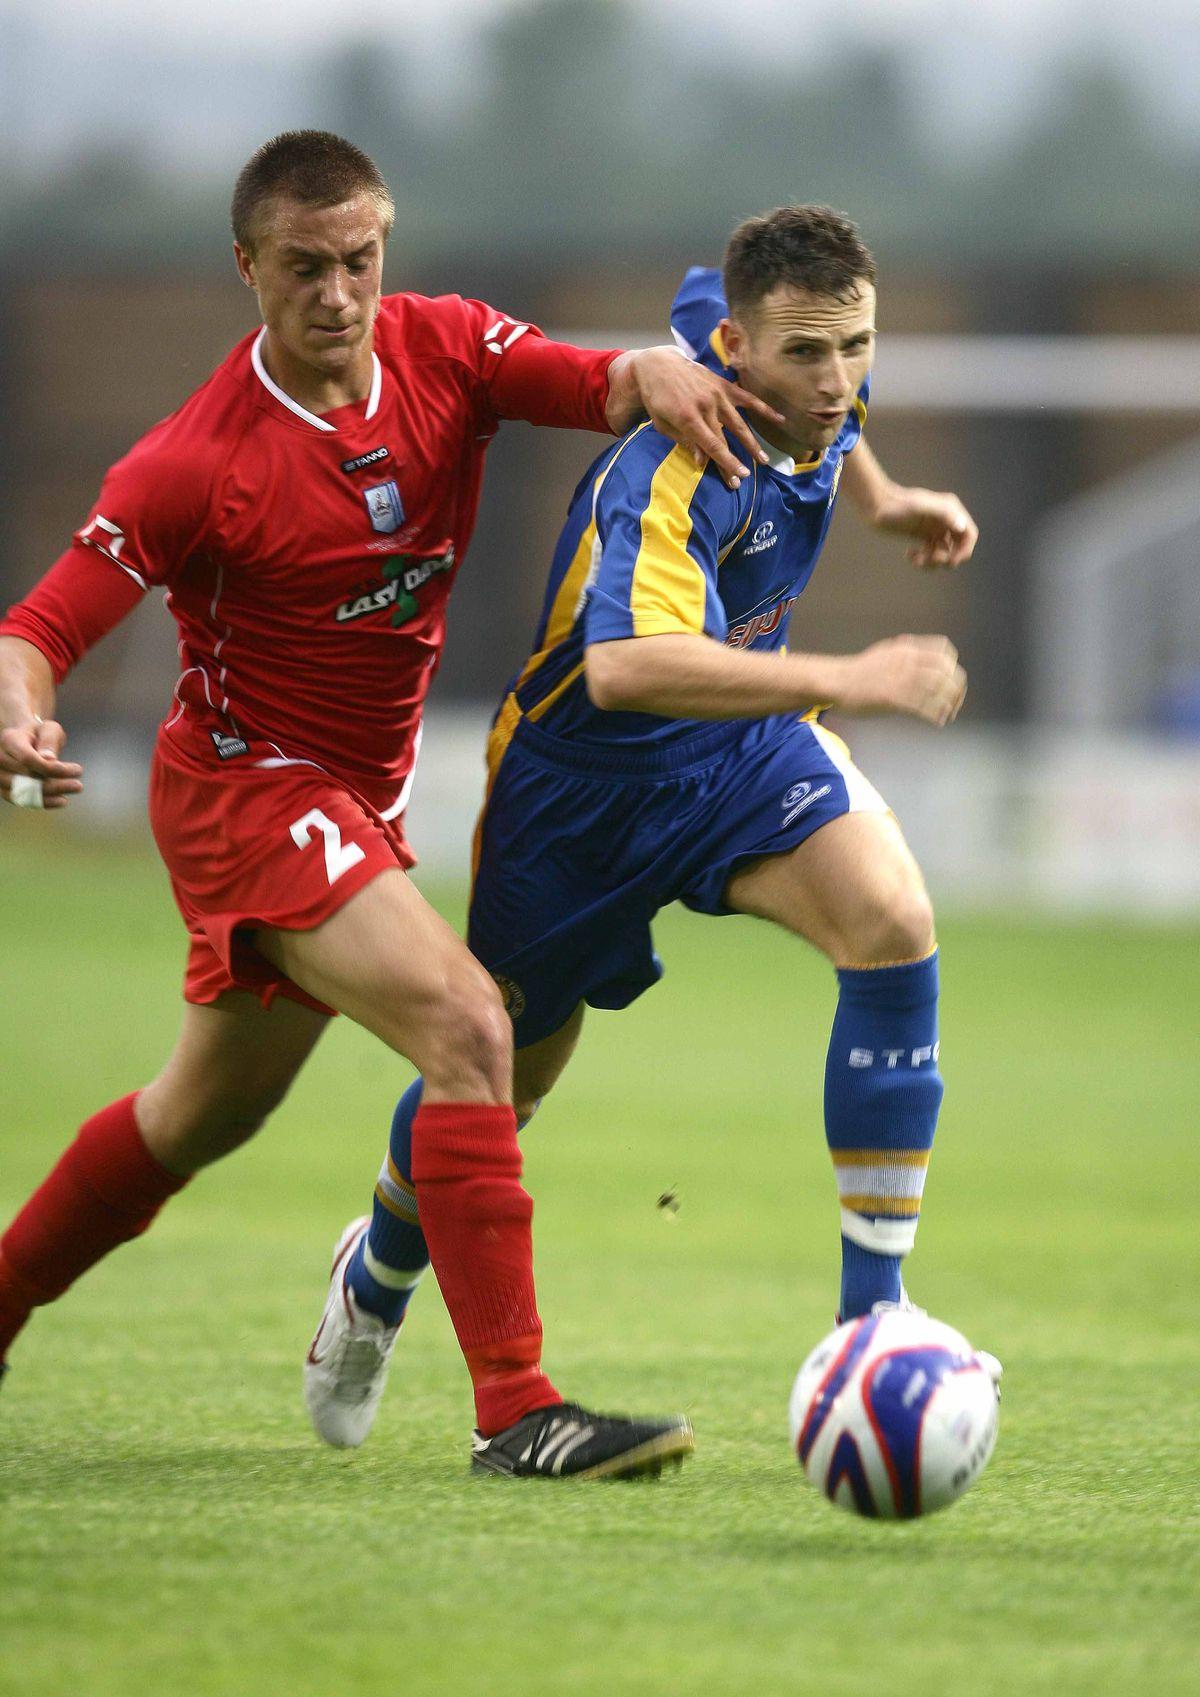 Shrewsbury Town v Market Drayton, Shropshire Senior Cup Marc Pugh takes on Drayton full-back Jason Francis